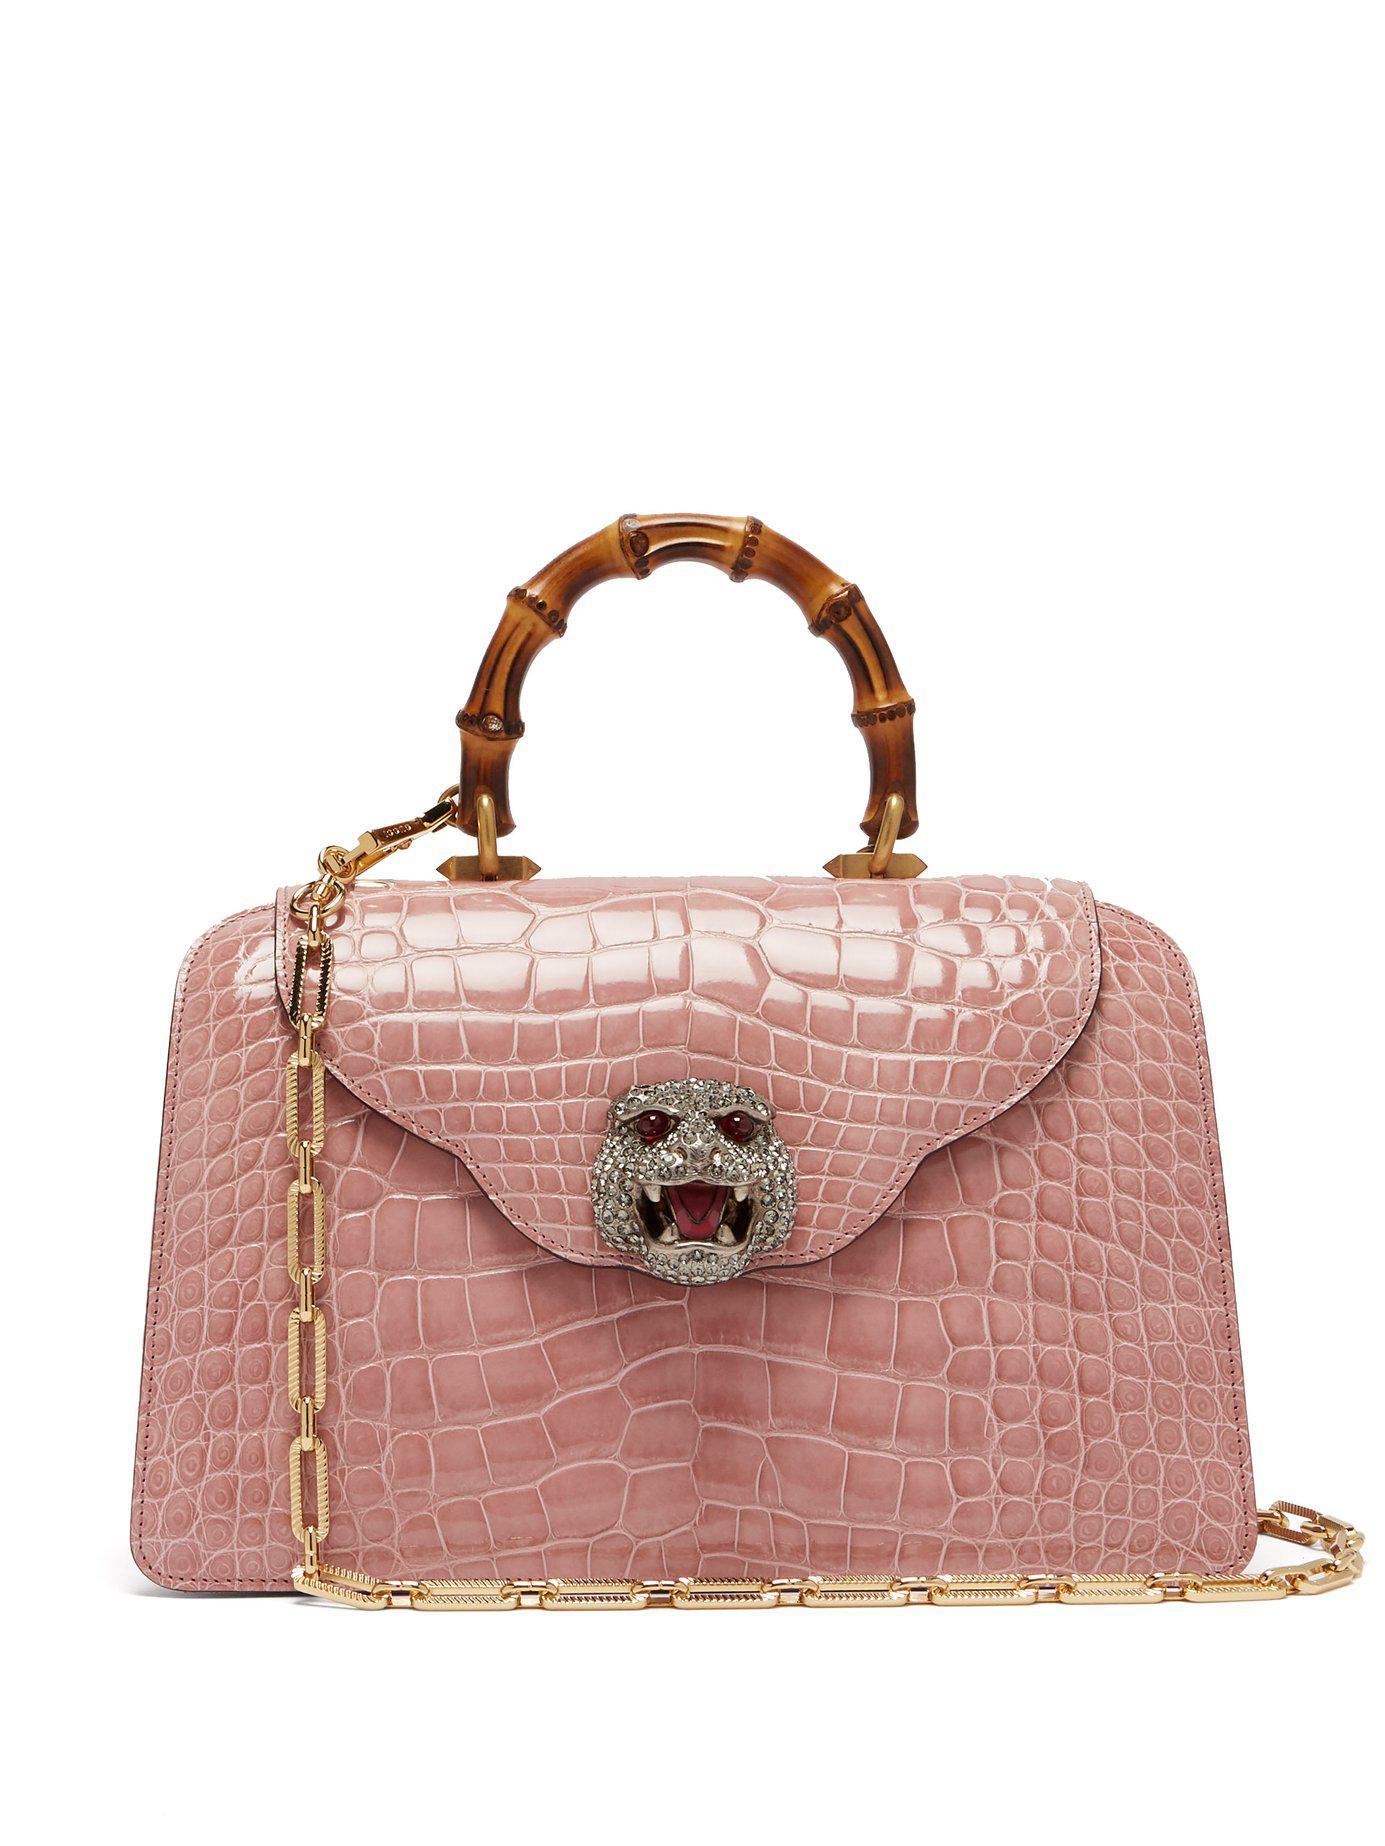 33955291d1f Lyst - Gucci Thiara Bamboo Handle Crocodile Leather Bag in Pink